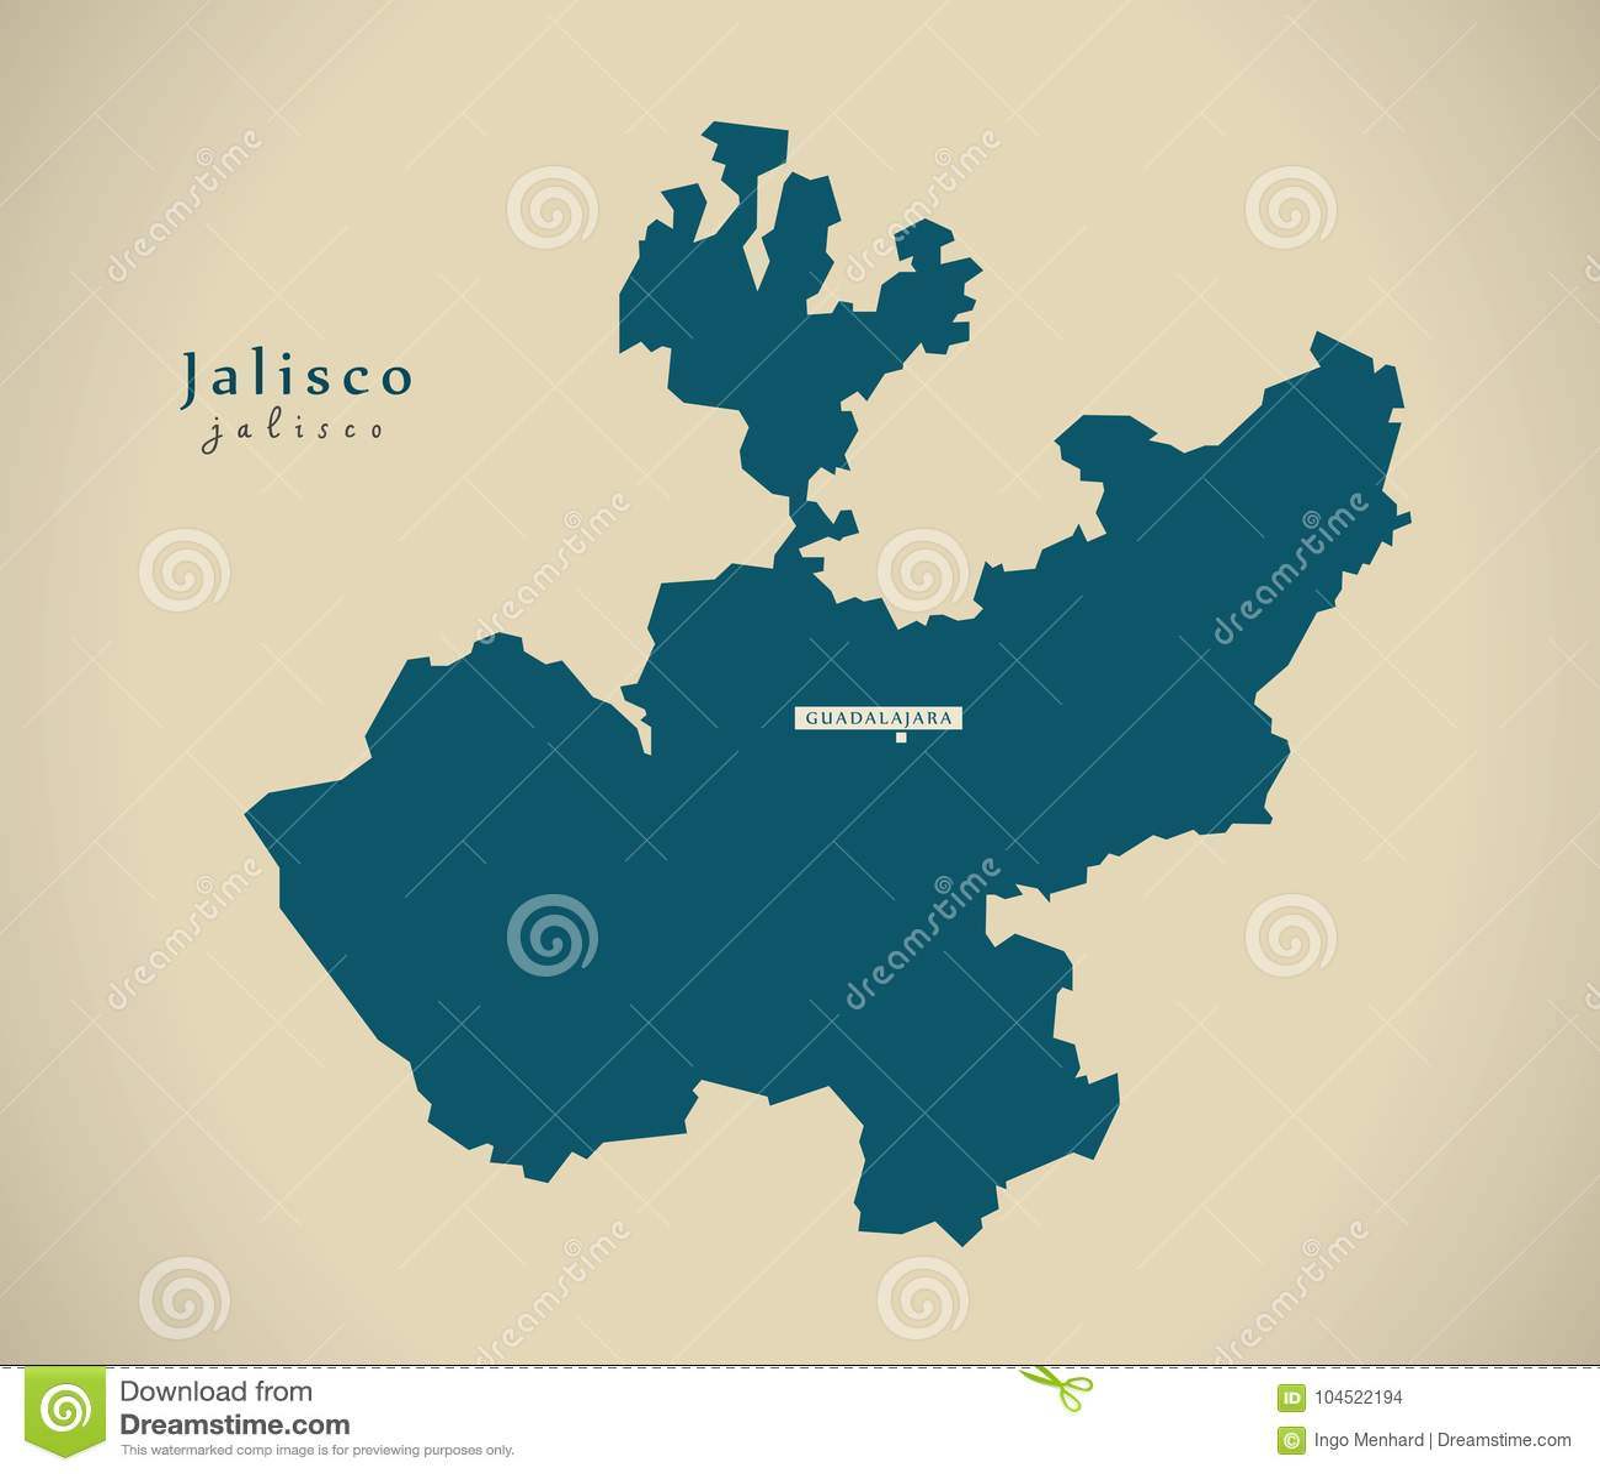 Modern Map - Jalisco Mexico MX Stock Illustration - Illustration of on